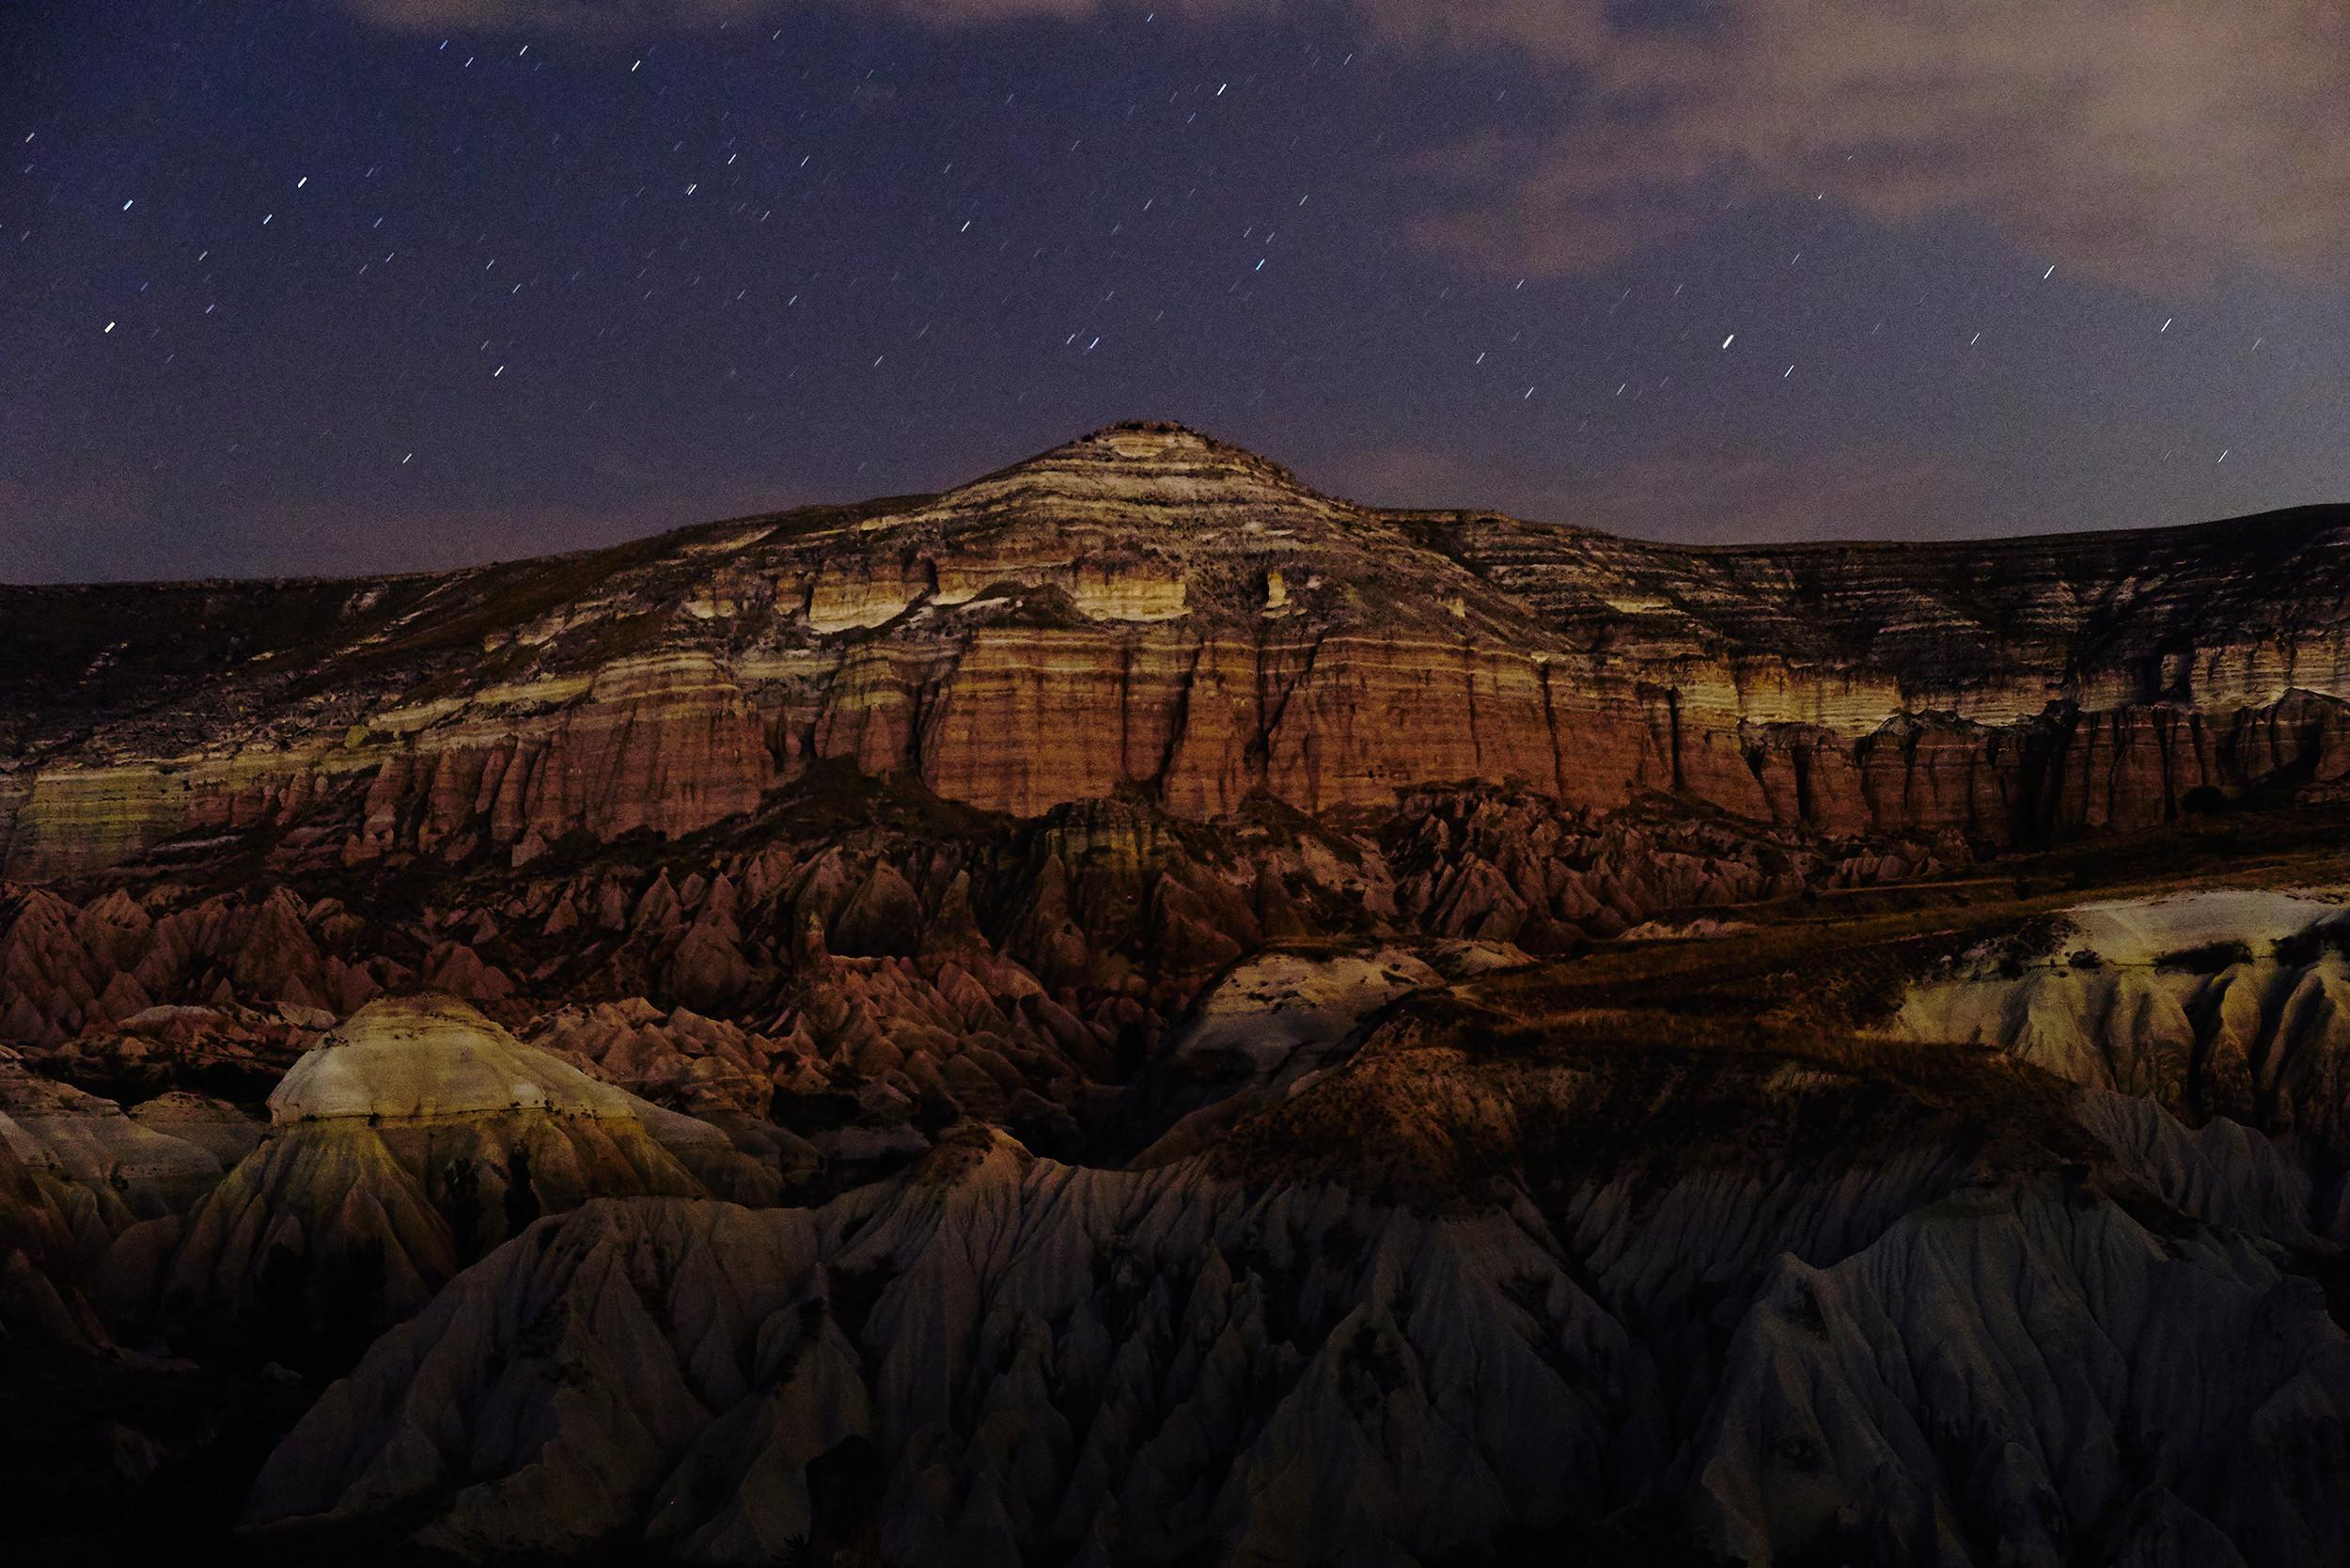 Rose Valley, Cappadocia after dark